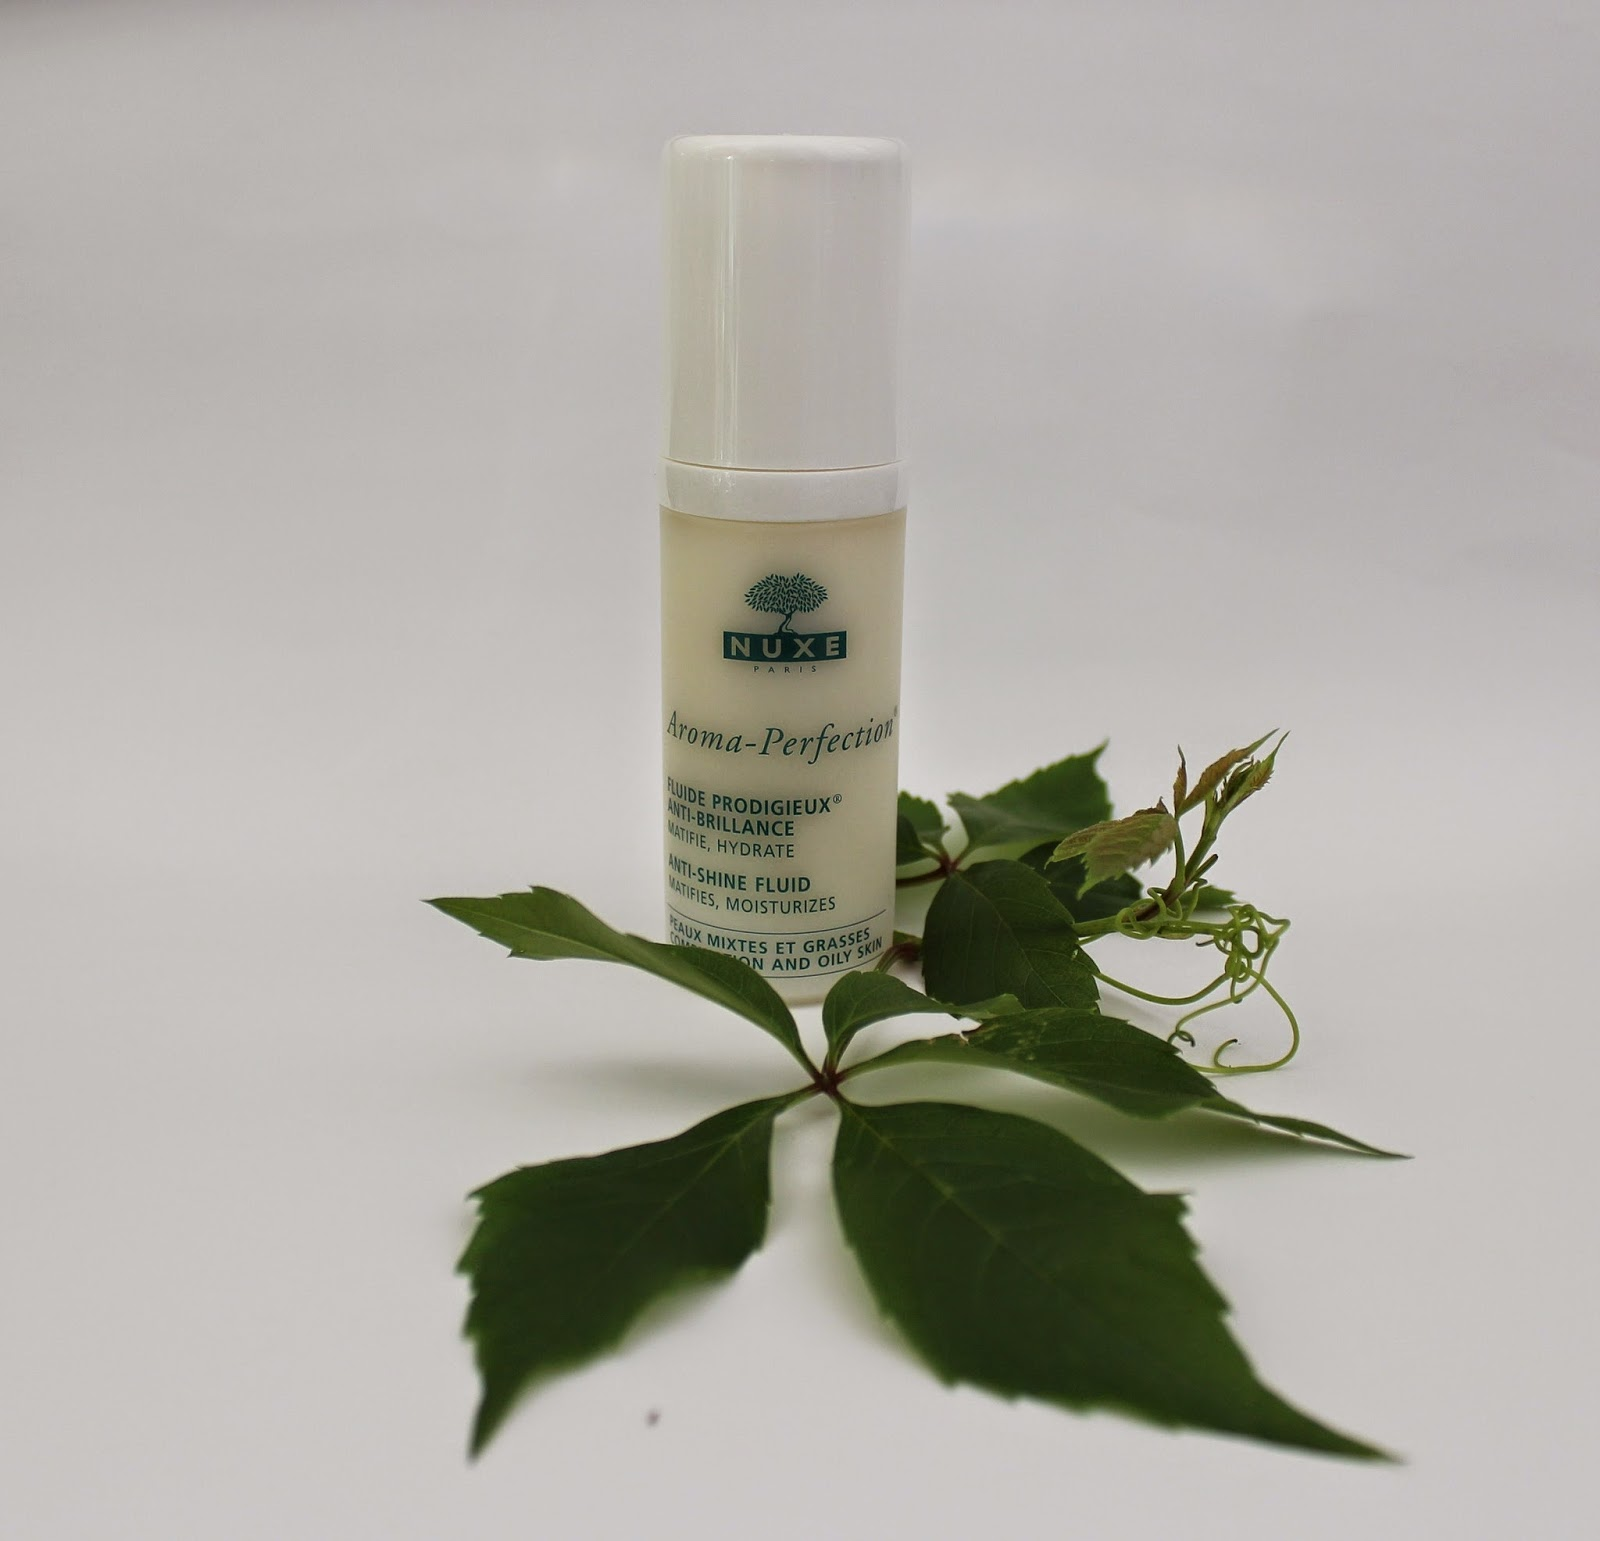 Nuxe Aroma-Perfection Anti-Shine Fluid